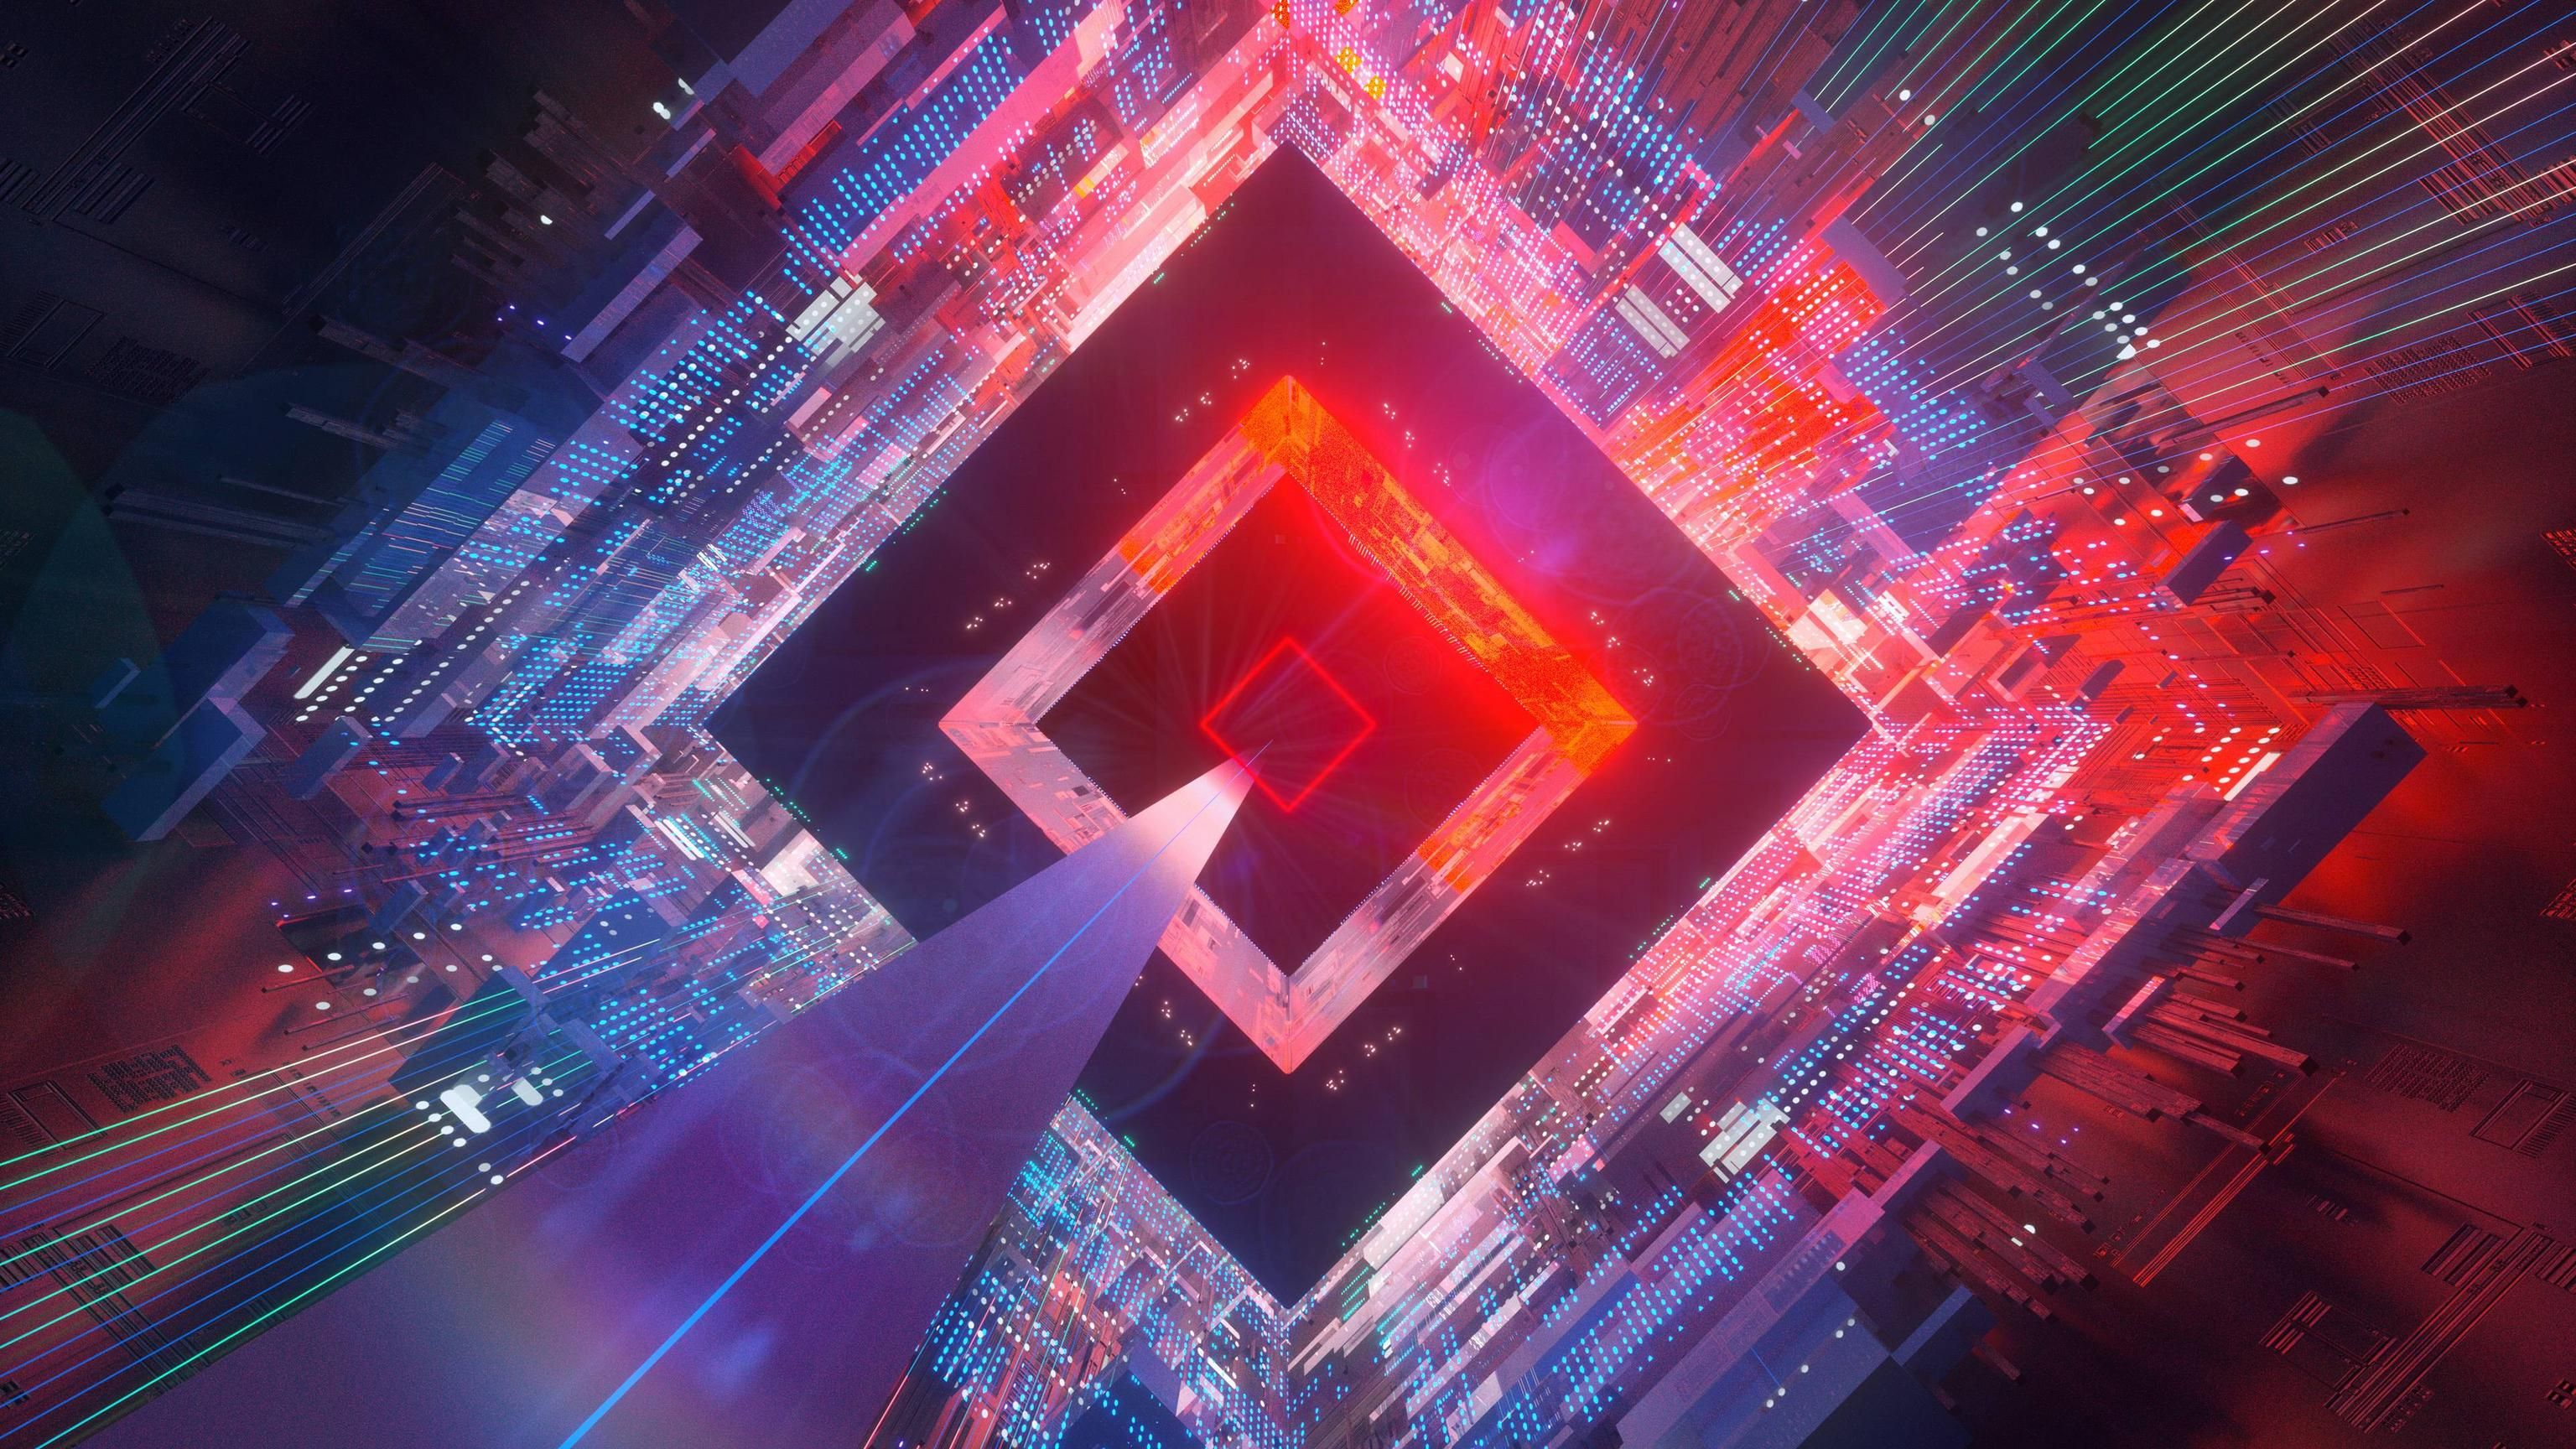 3d Abstract 4k Wallpaper 3840 X 2160 In 2020 Digital Art